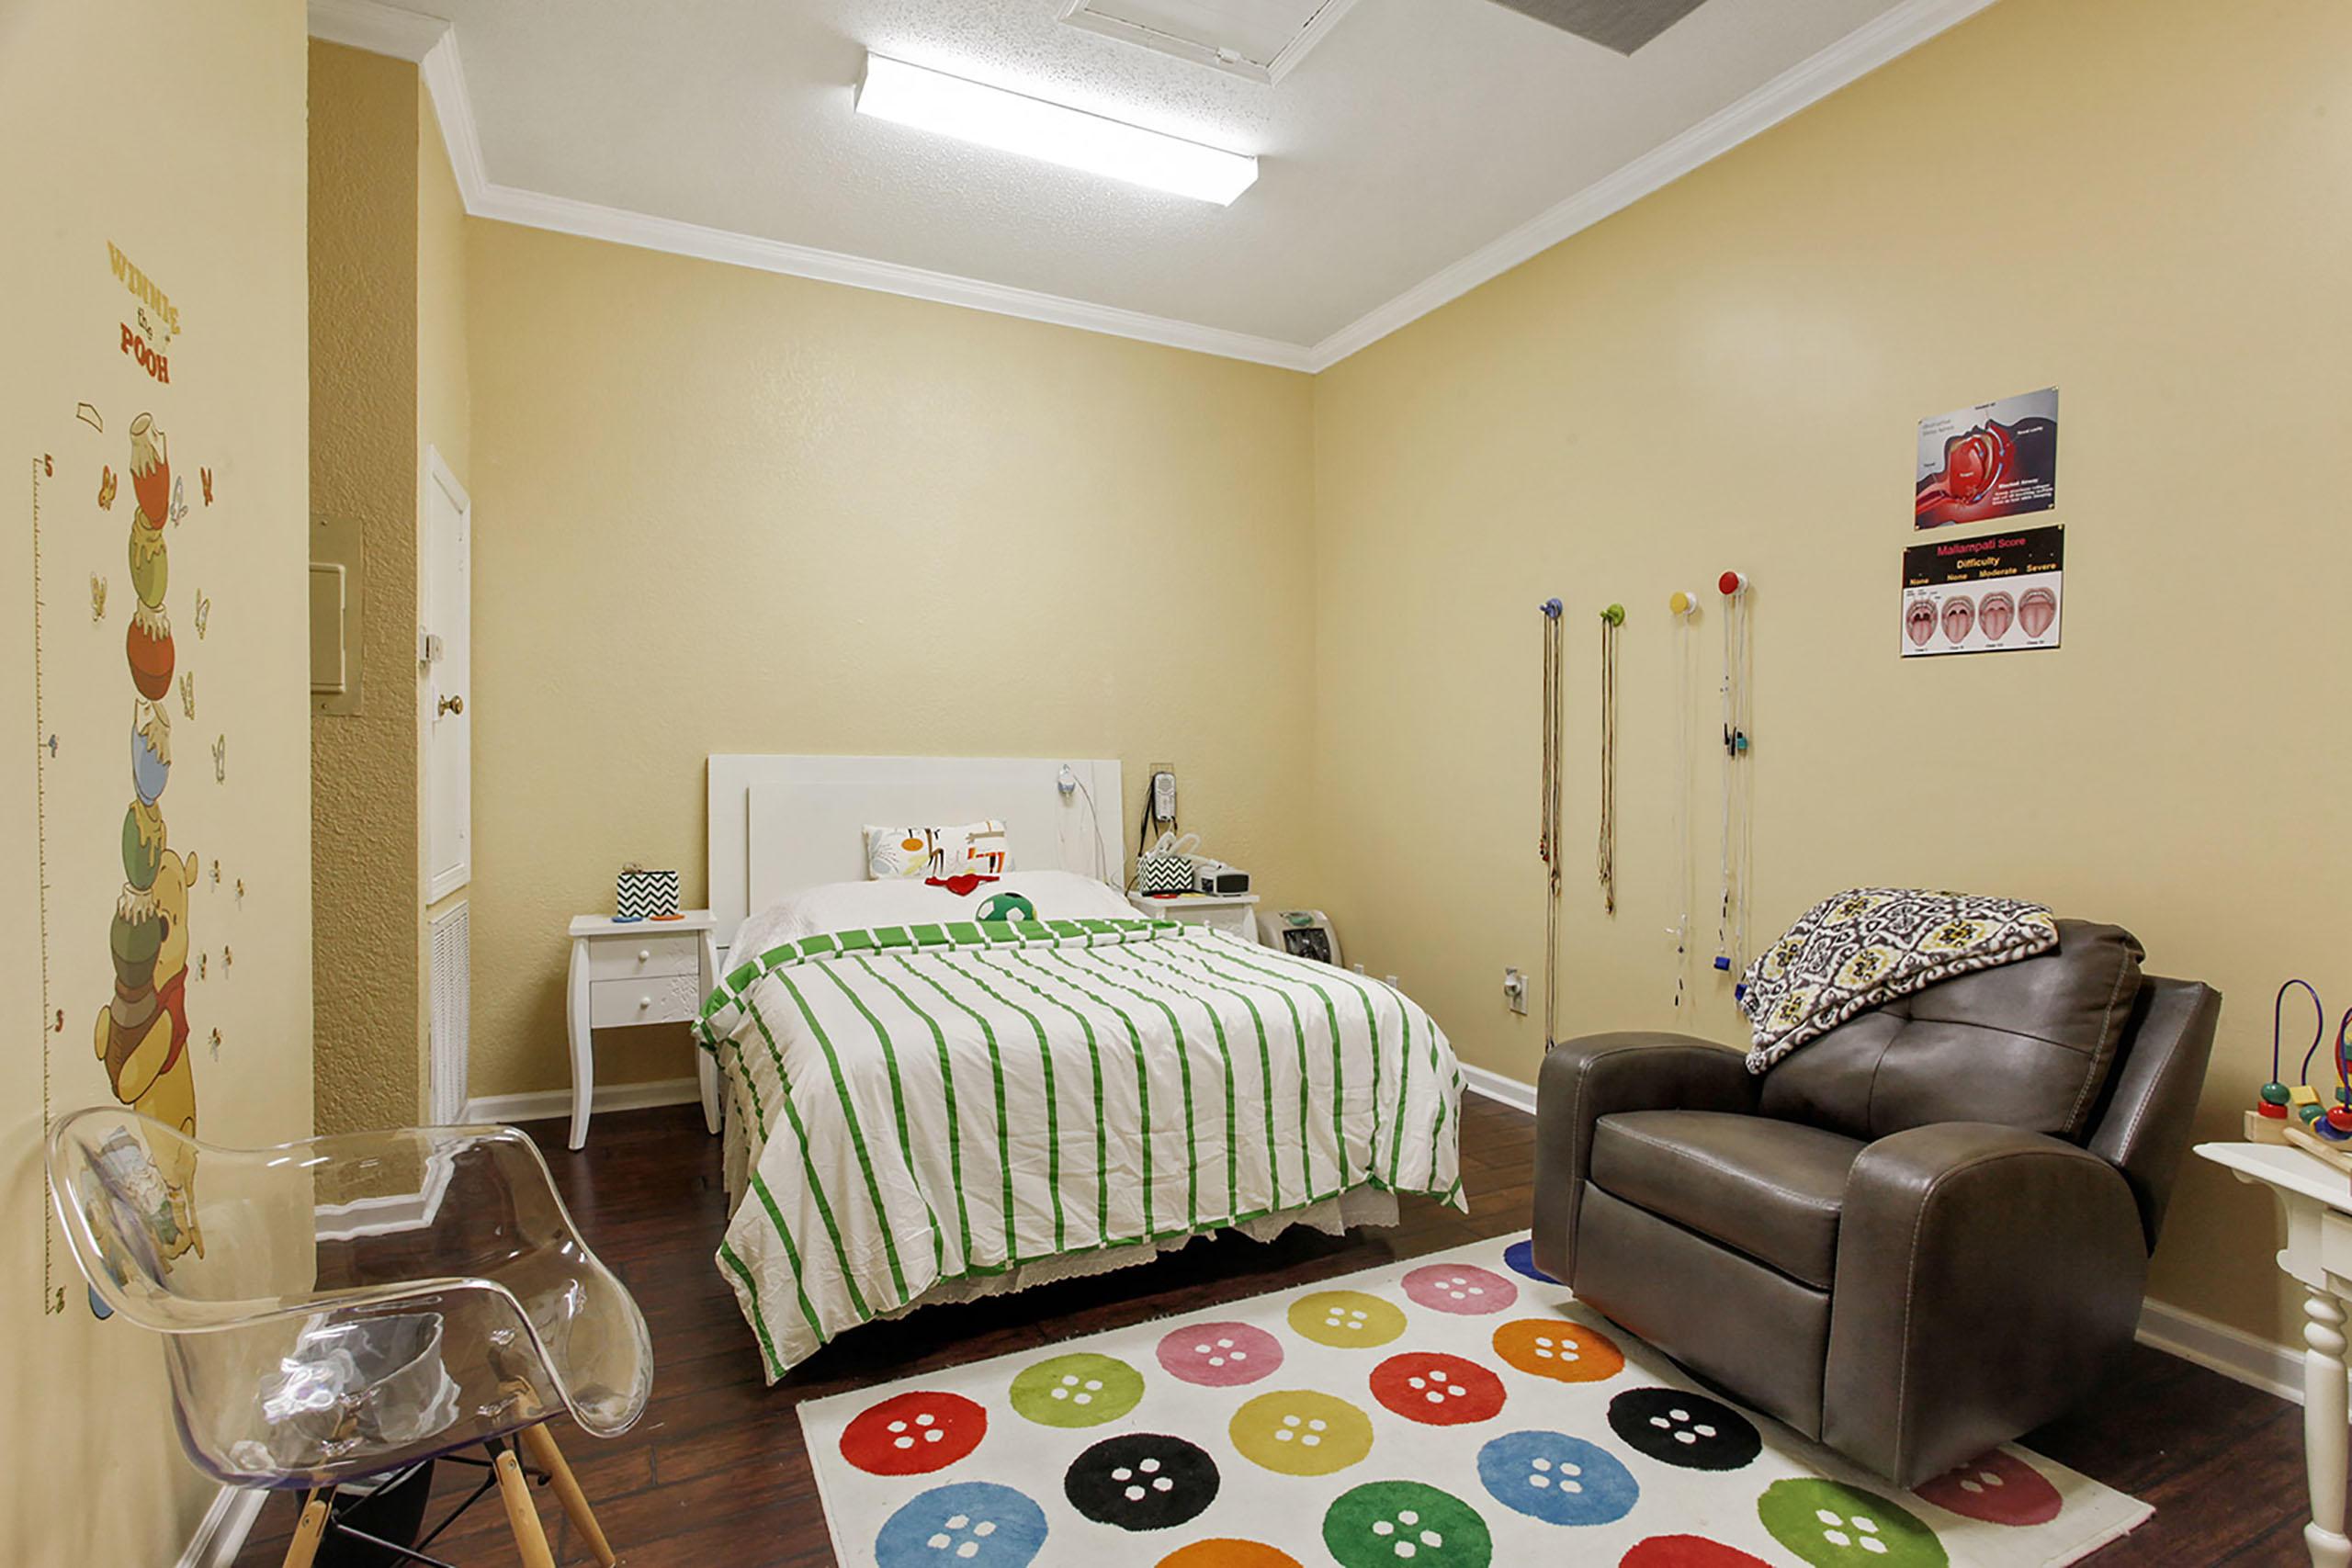 Sleep Center of New Orleans image 5